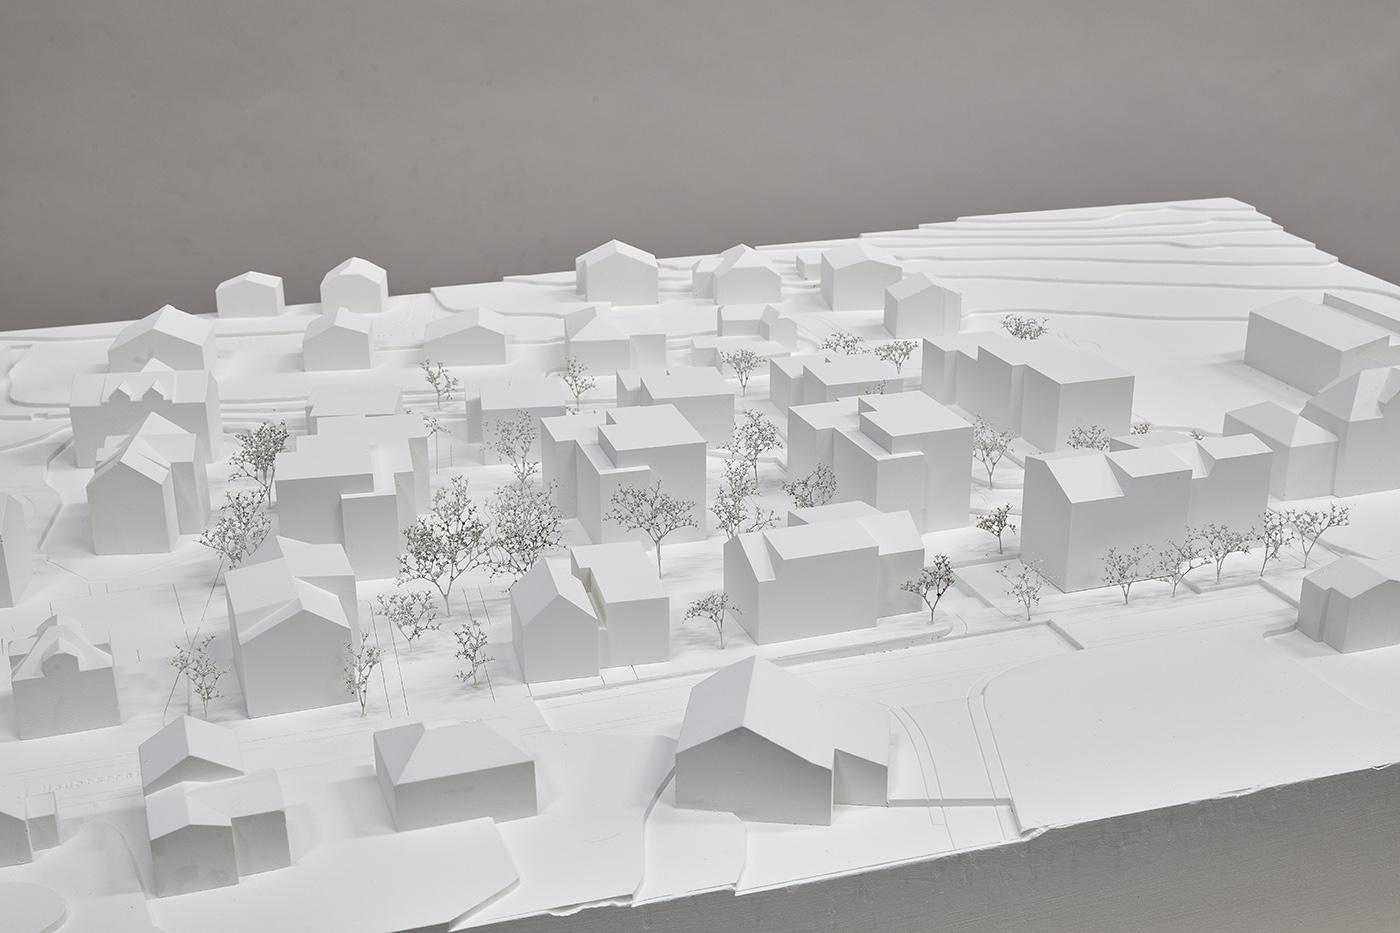 buan architekten – Studienauftrag Areal Schuetzenmatt Inwil – Modell – 1